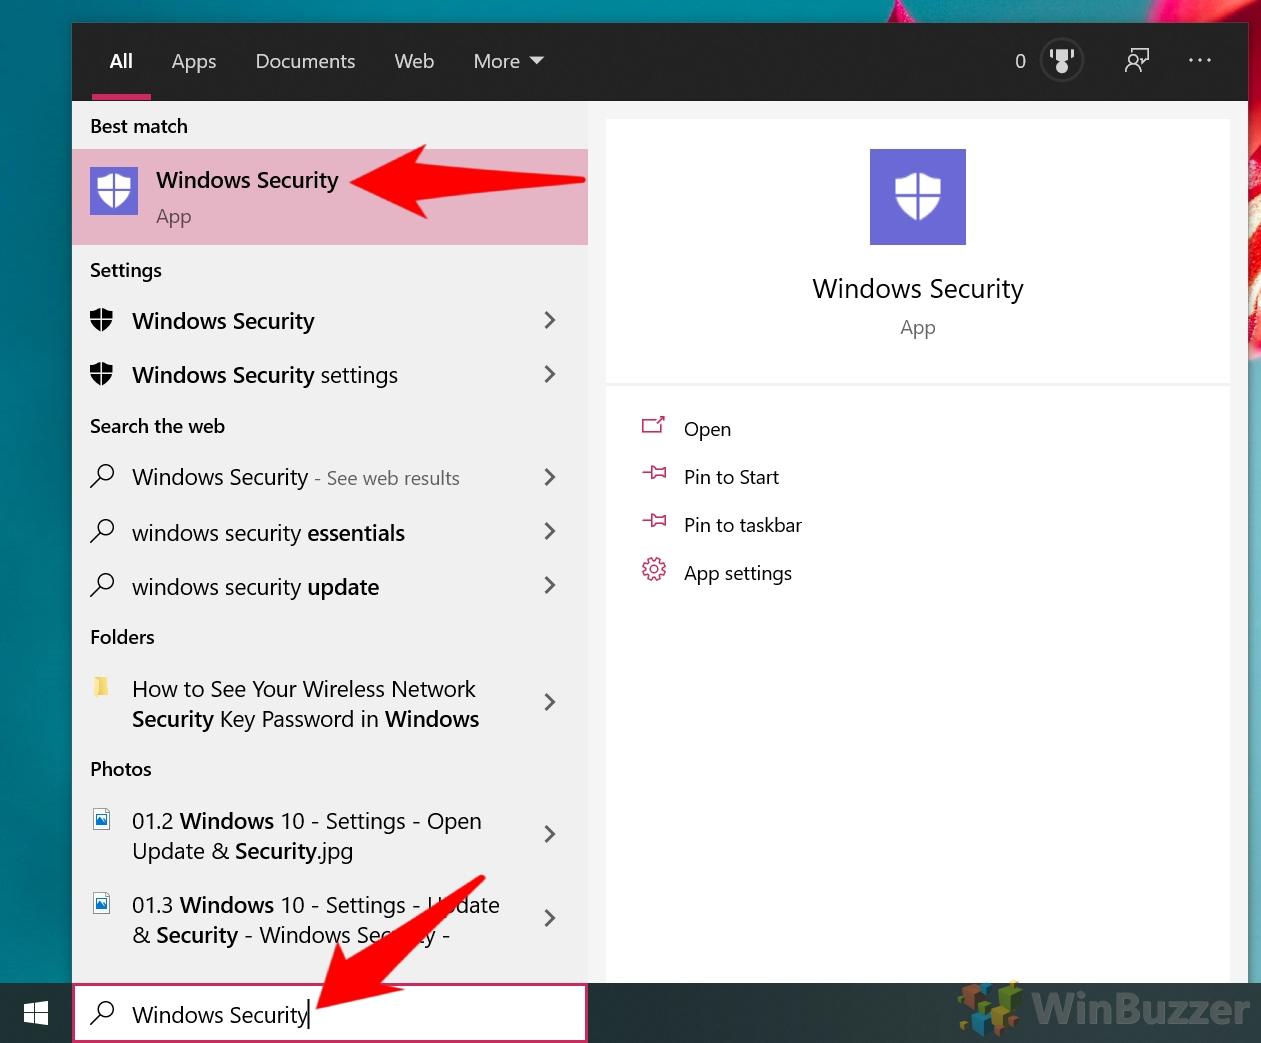 Windows 10 - Open Windows Security